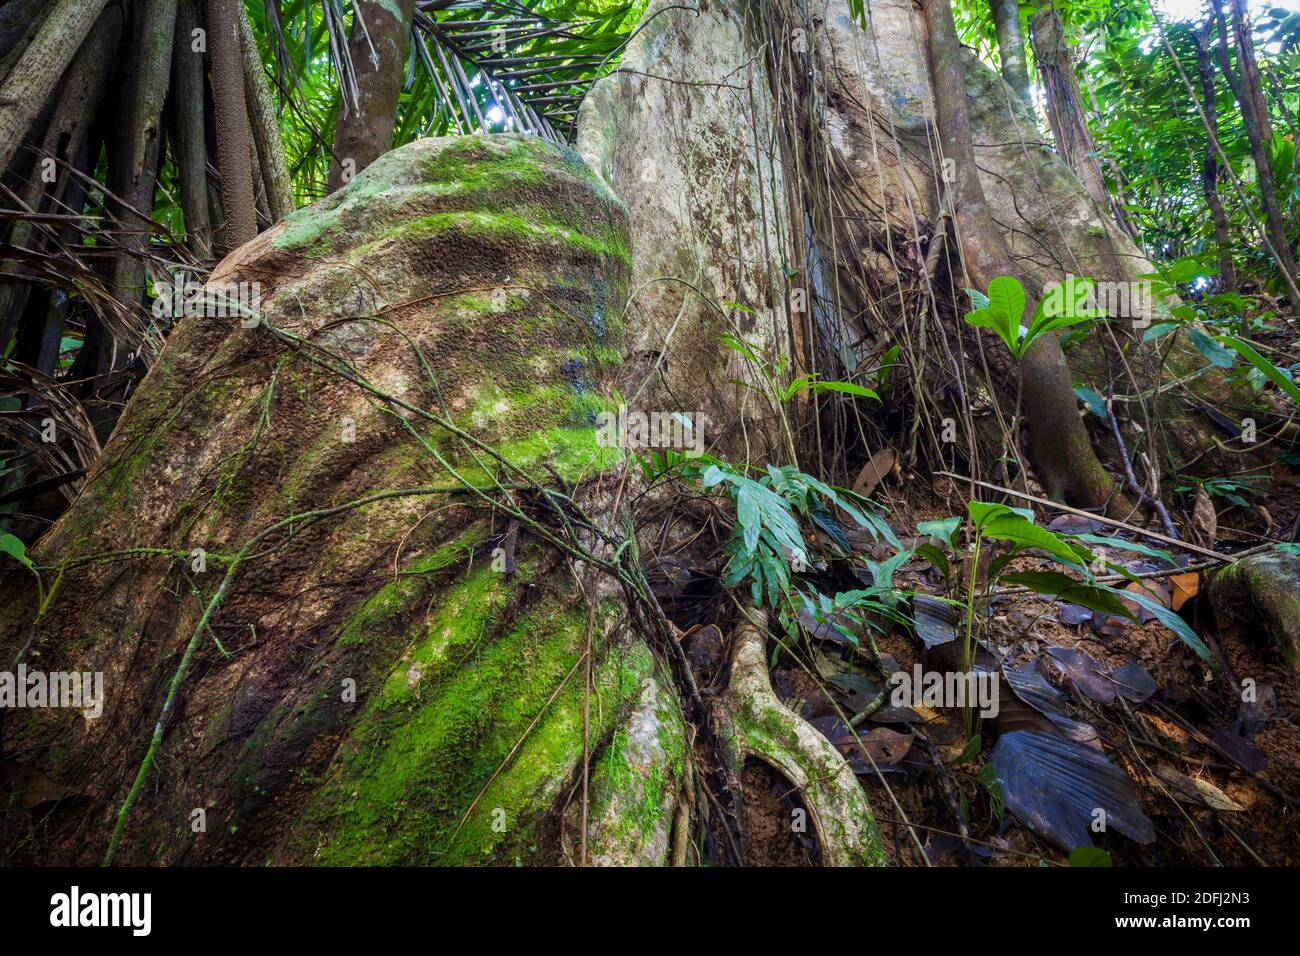 Large ceiba tree, Ceiba pentandra, in the rainforest of Burbayar nature reserve, Panama province, Republic of Panama. Stock Photo